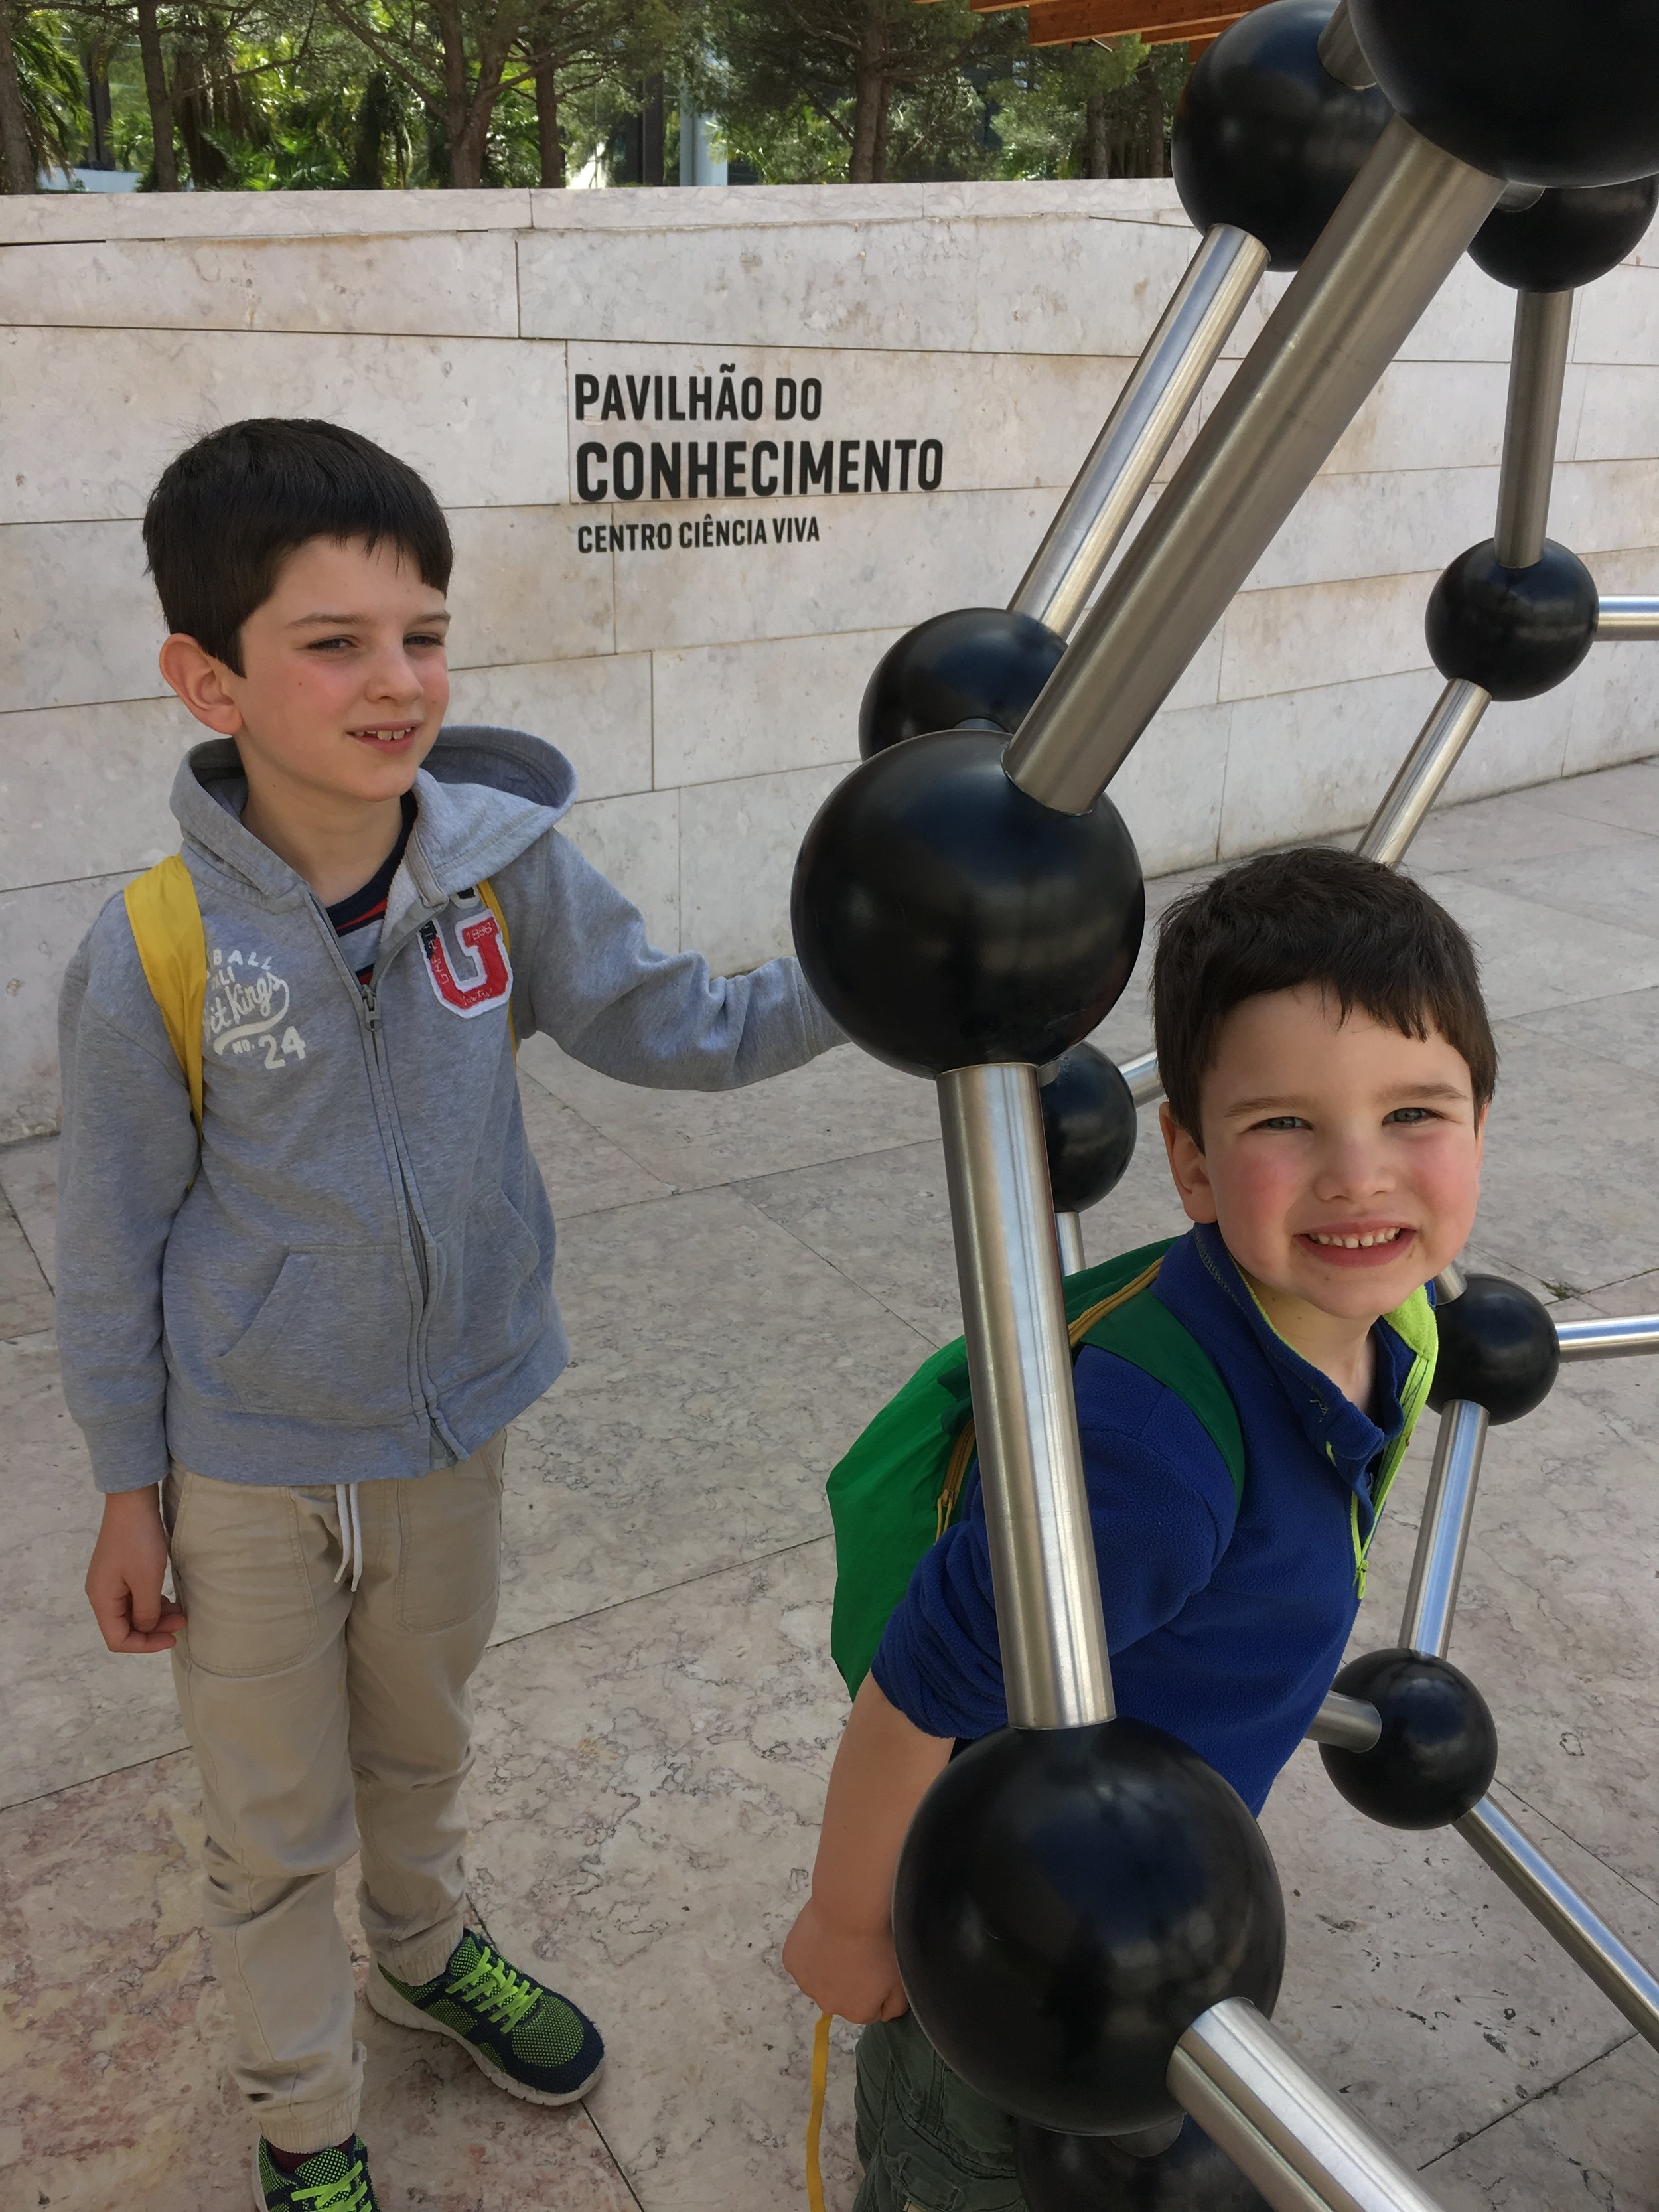 Outside Lisbon's Science Museum